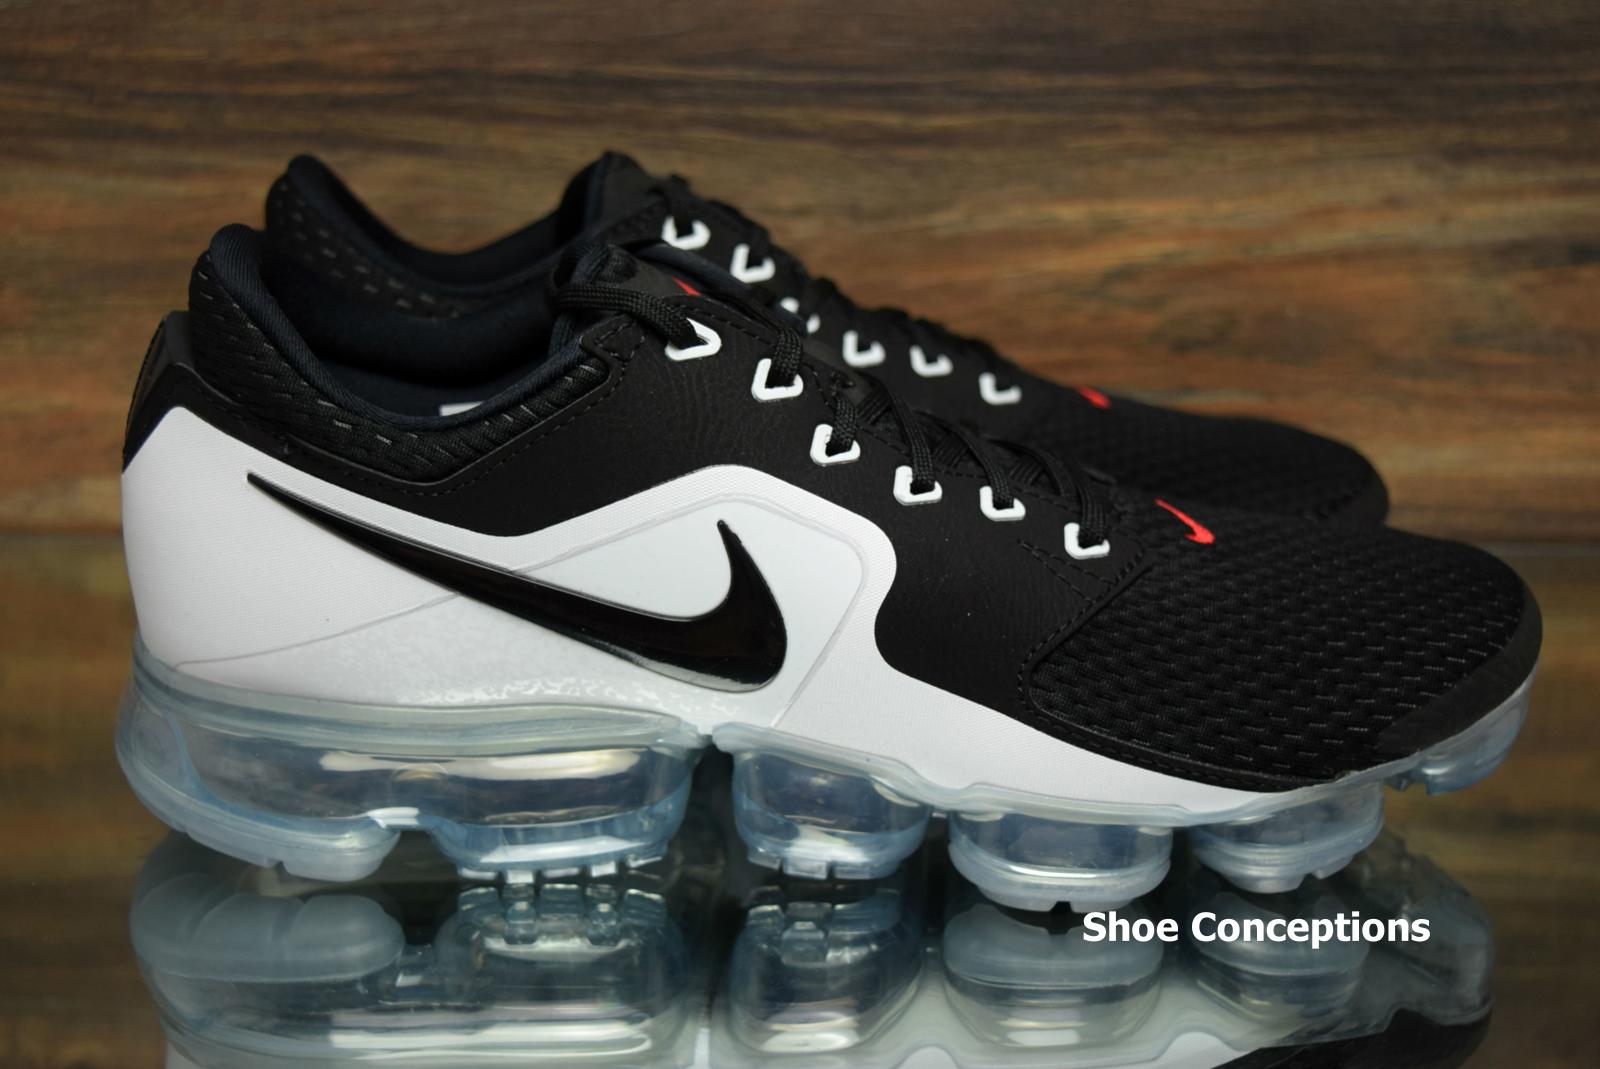 Nike air vapormax schwarz  - - ah9046-003 laufschuhe  schwarz - multi - ecf285